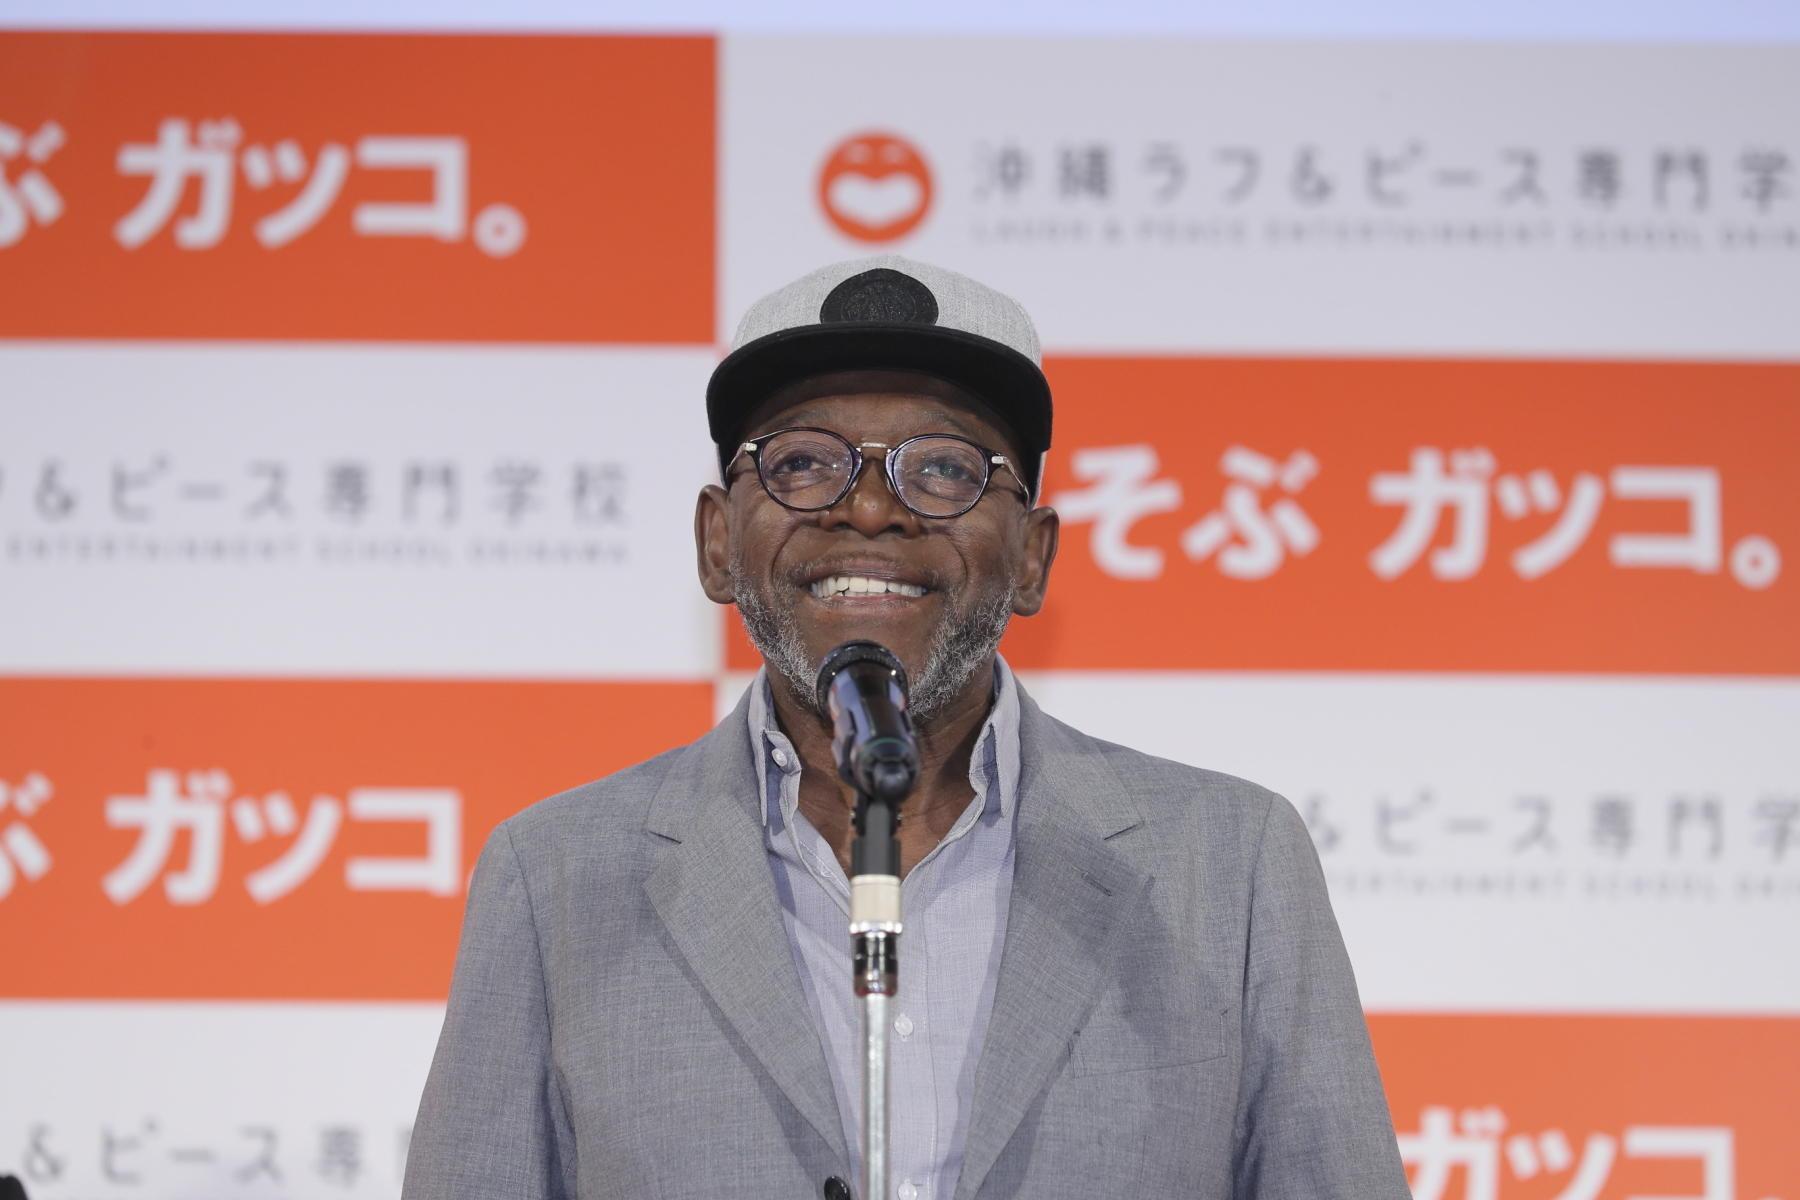 http://news.yoshimoto.co.jp/20171006102627-17d35c6469def3d39793394f1081a3e6309217b7.jpg